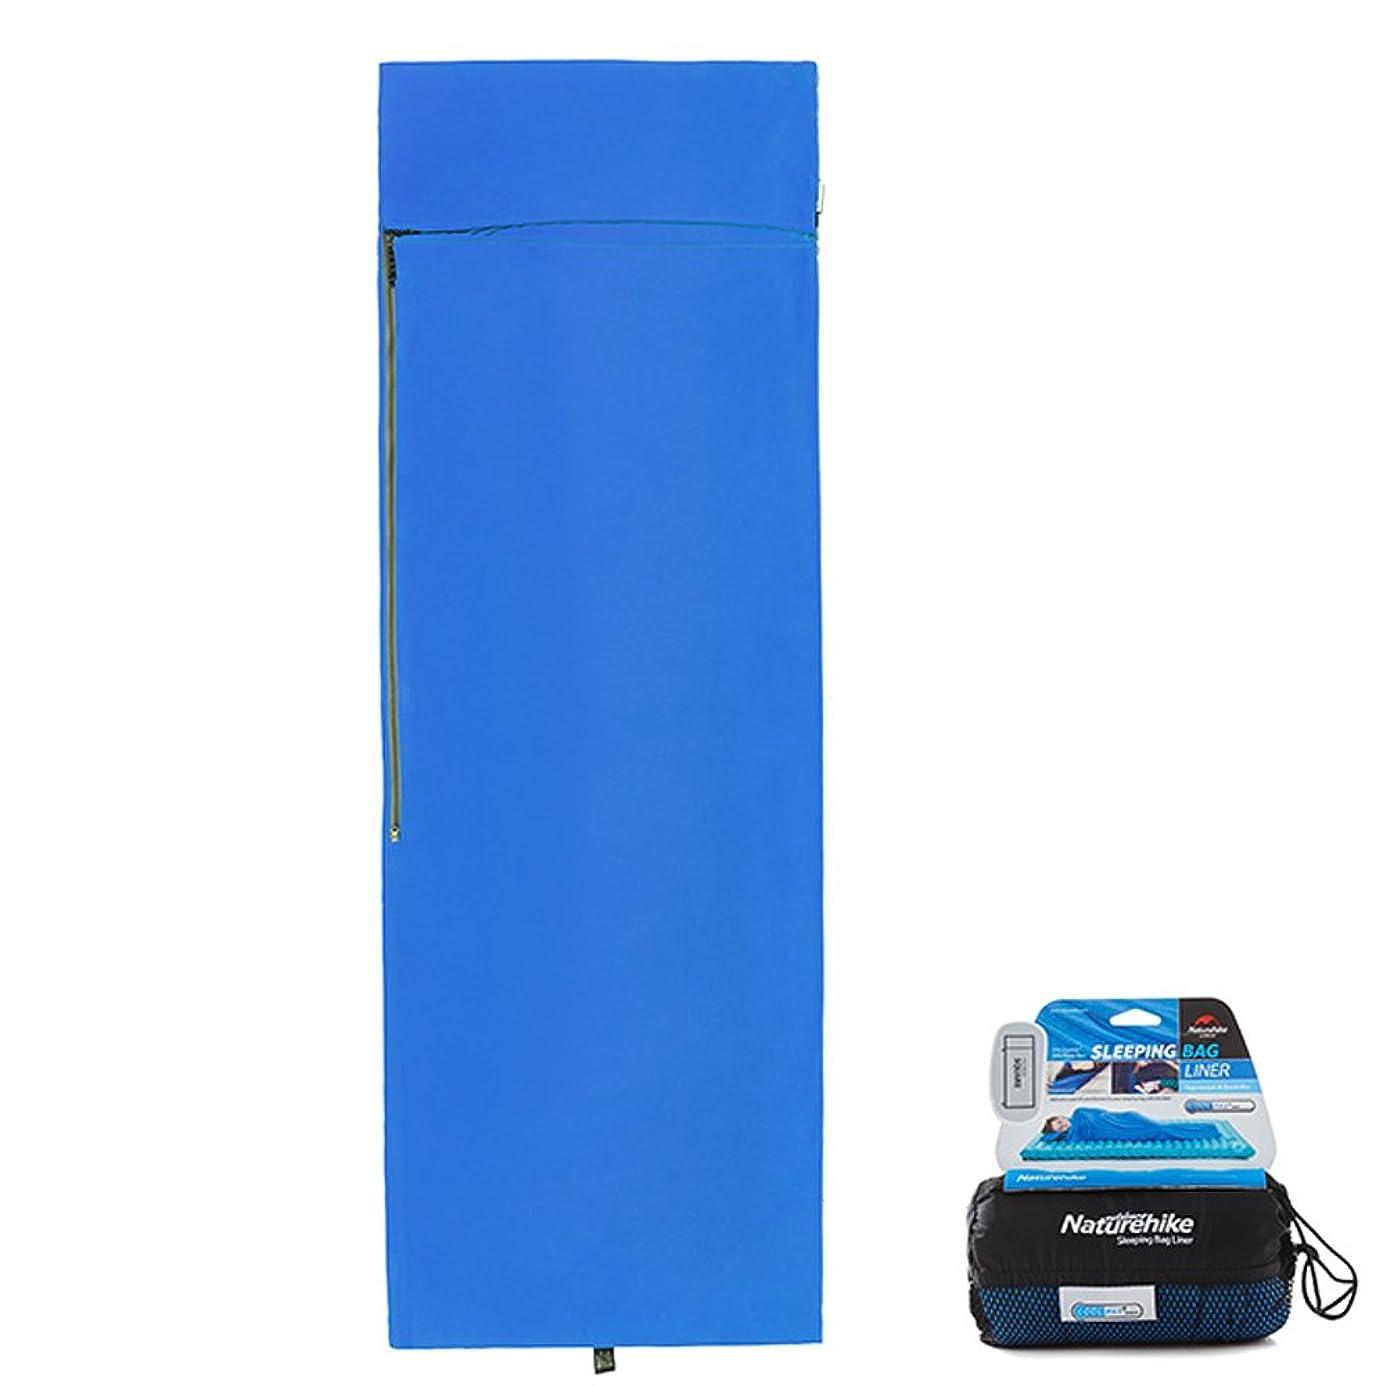 Tentock Coolmax Quick-Drying Breathable Single Sleeping Bag Liner Envelope/Mummy Sleeping Sack Portable Adult 3 Season Travel Sheet for Camping Hiking Backpacking Road-Trip